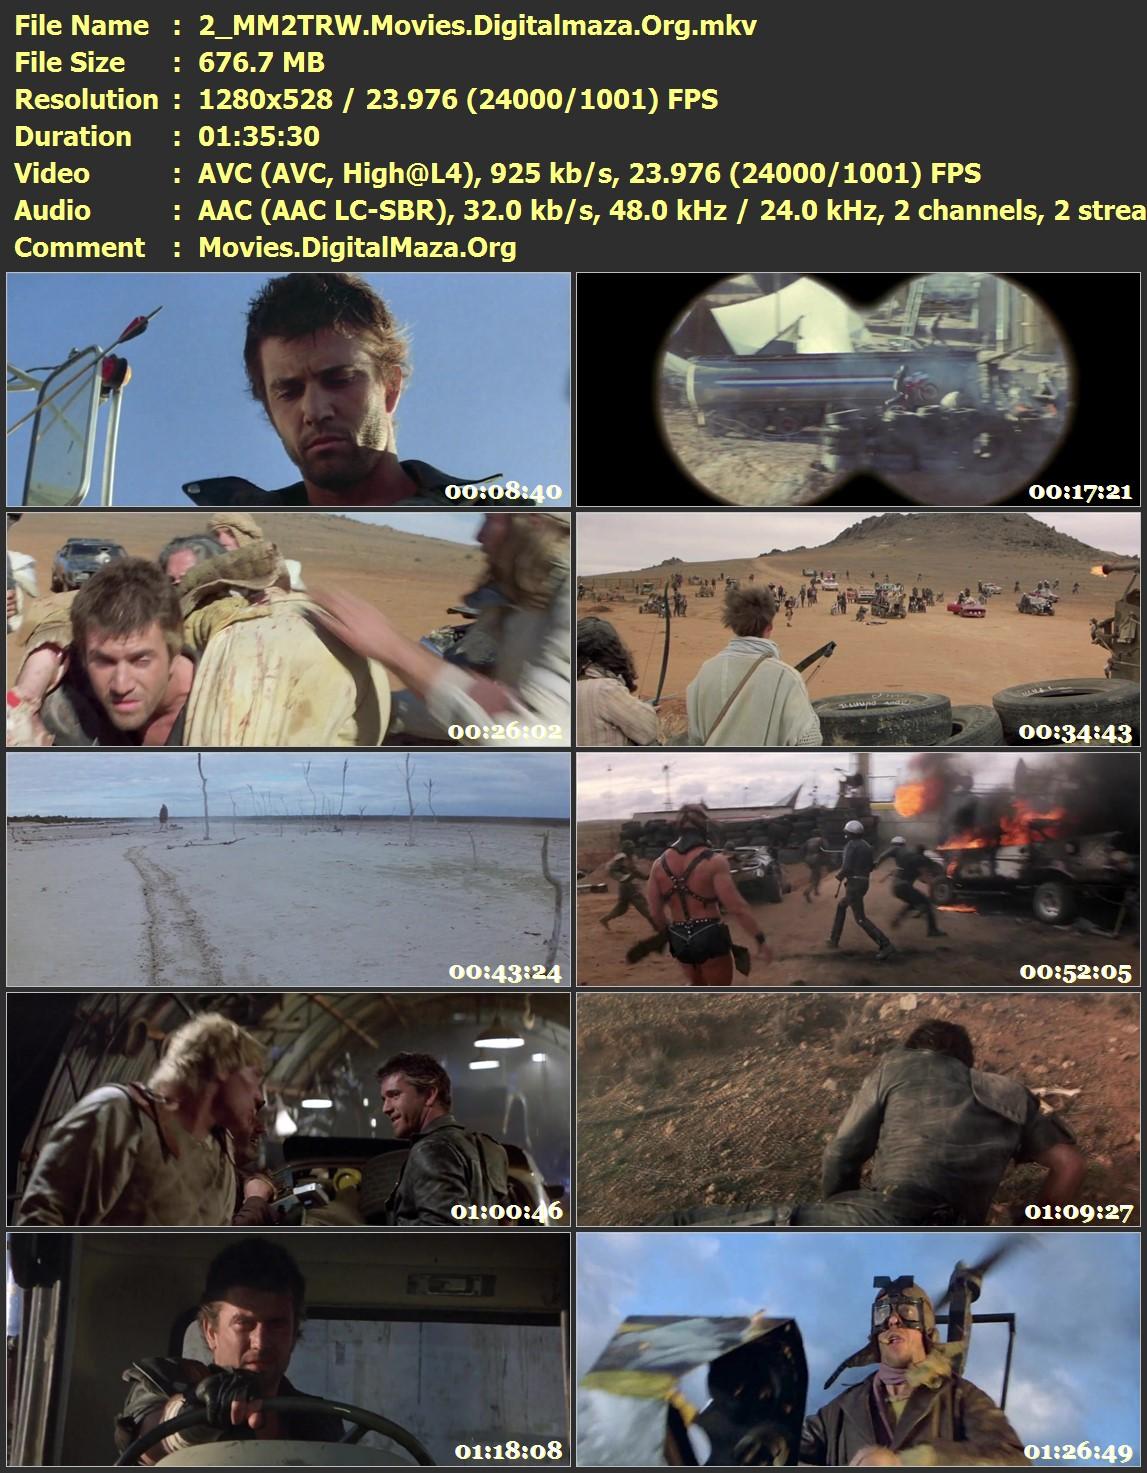 https://image.ibb.co/fsqcNc/2_MM2_TRW_Movies_Digitalmaza_Org_mkv.jpg